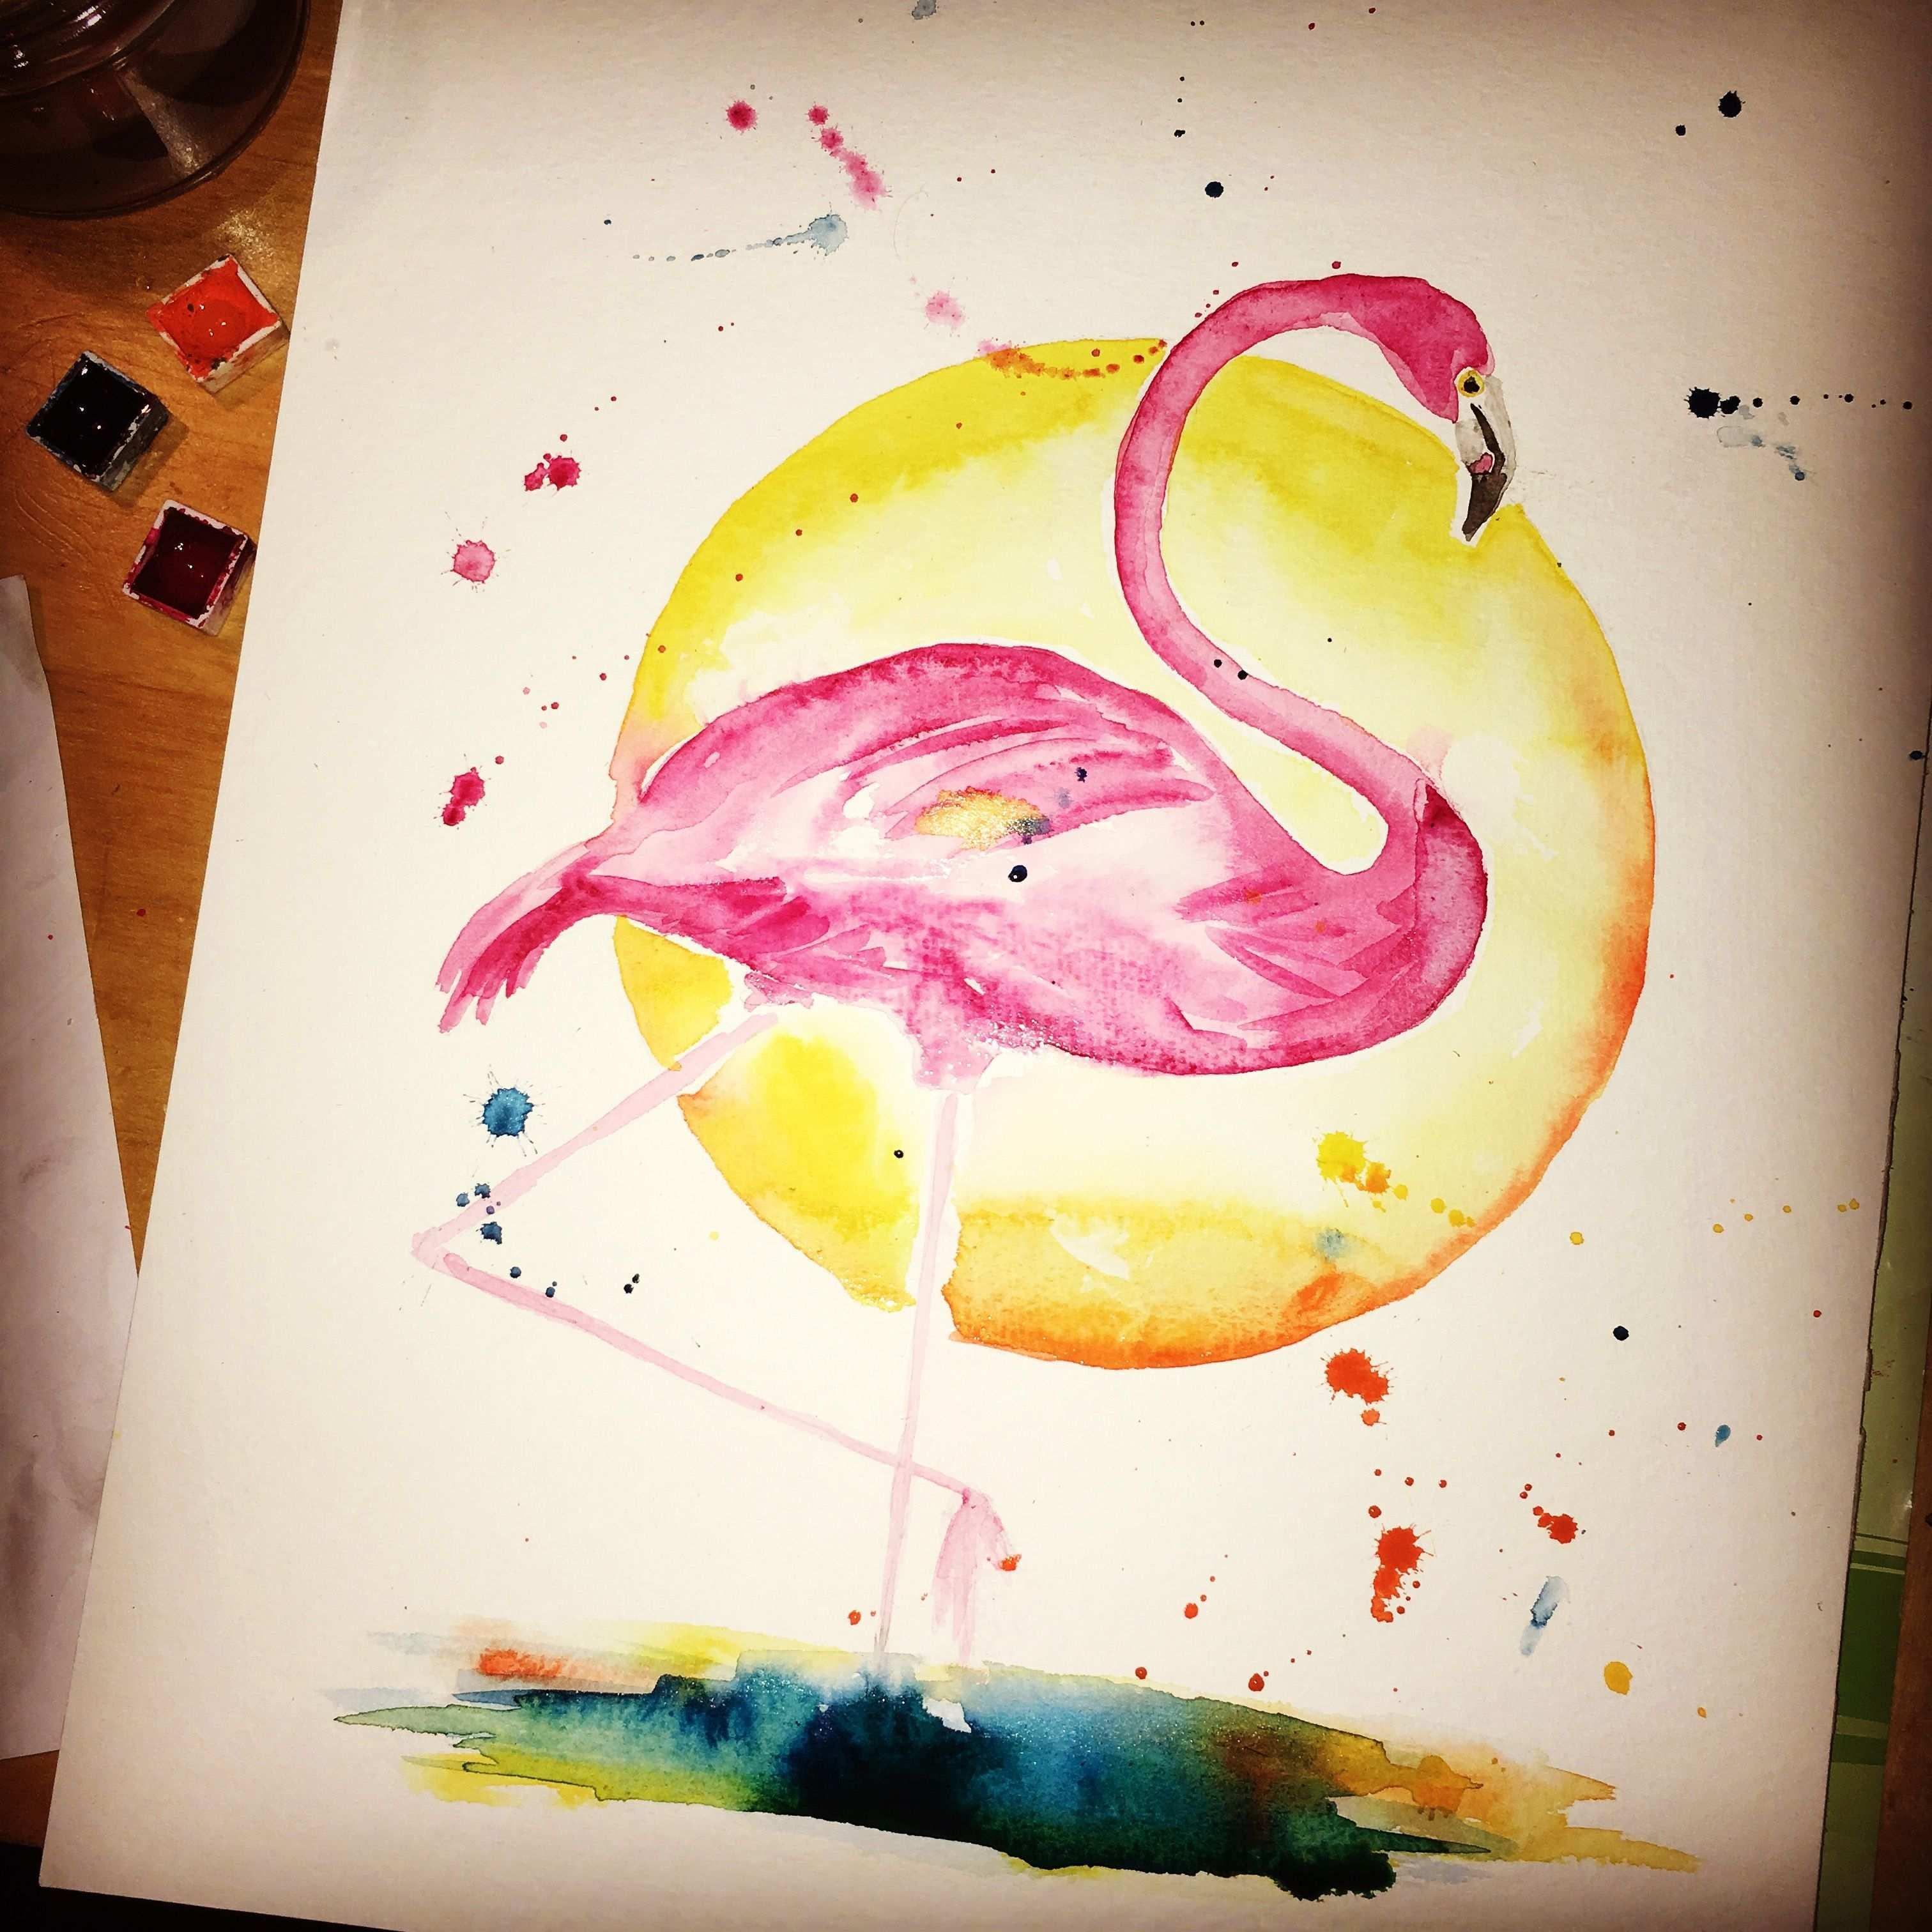 Flamingo Pink Aquarell Bunt Sonne Sonnenuntergang Exotisch Wasserfarbe Acrylbilder Selber Malen Acrylmalerei Malerei